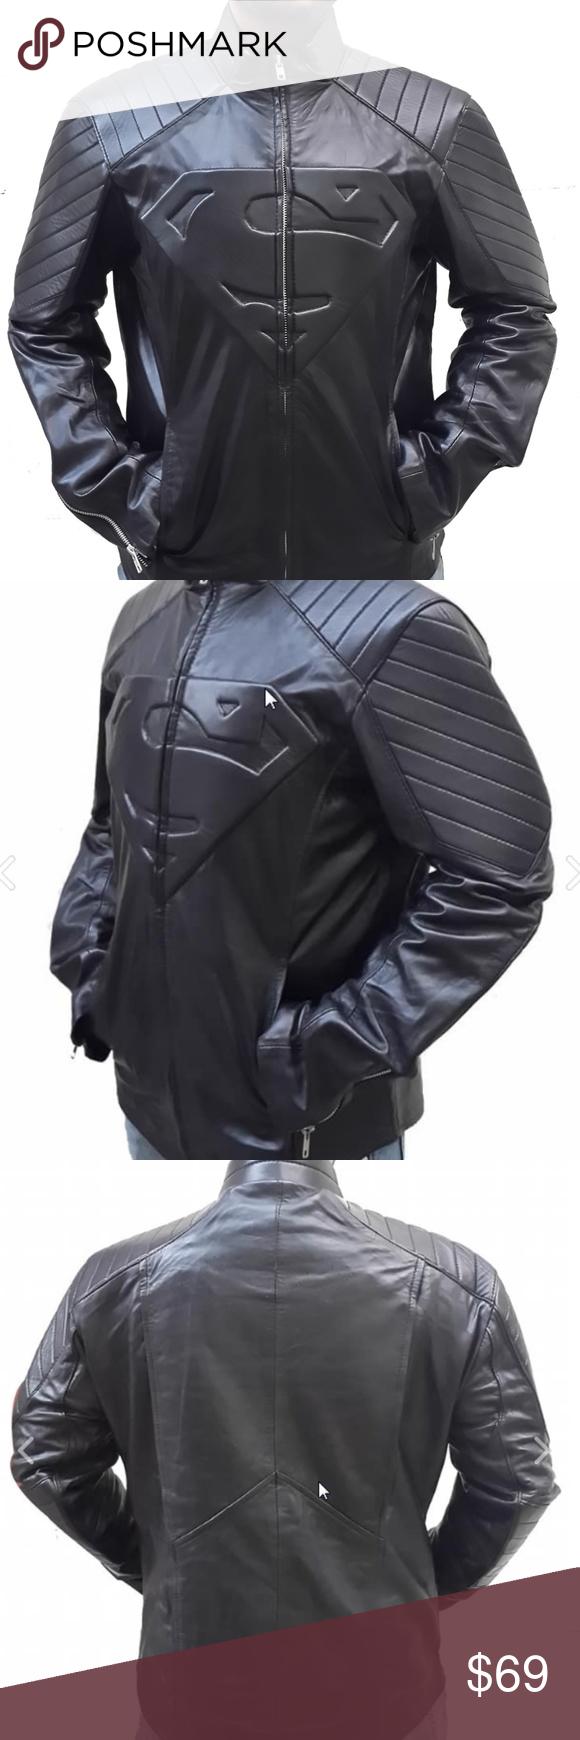 Superman Smallville Bikers Jacket NWT Jackets, Biker